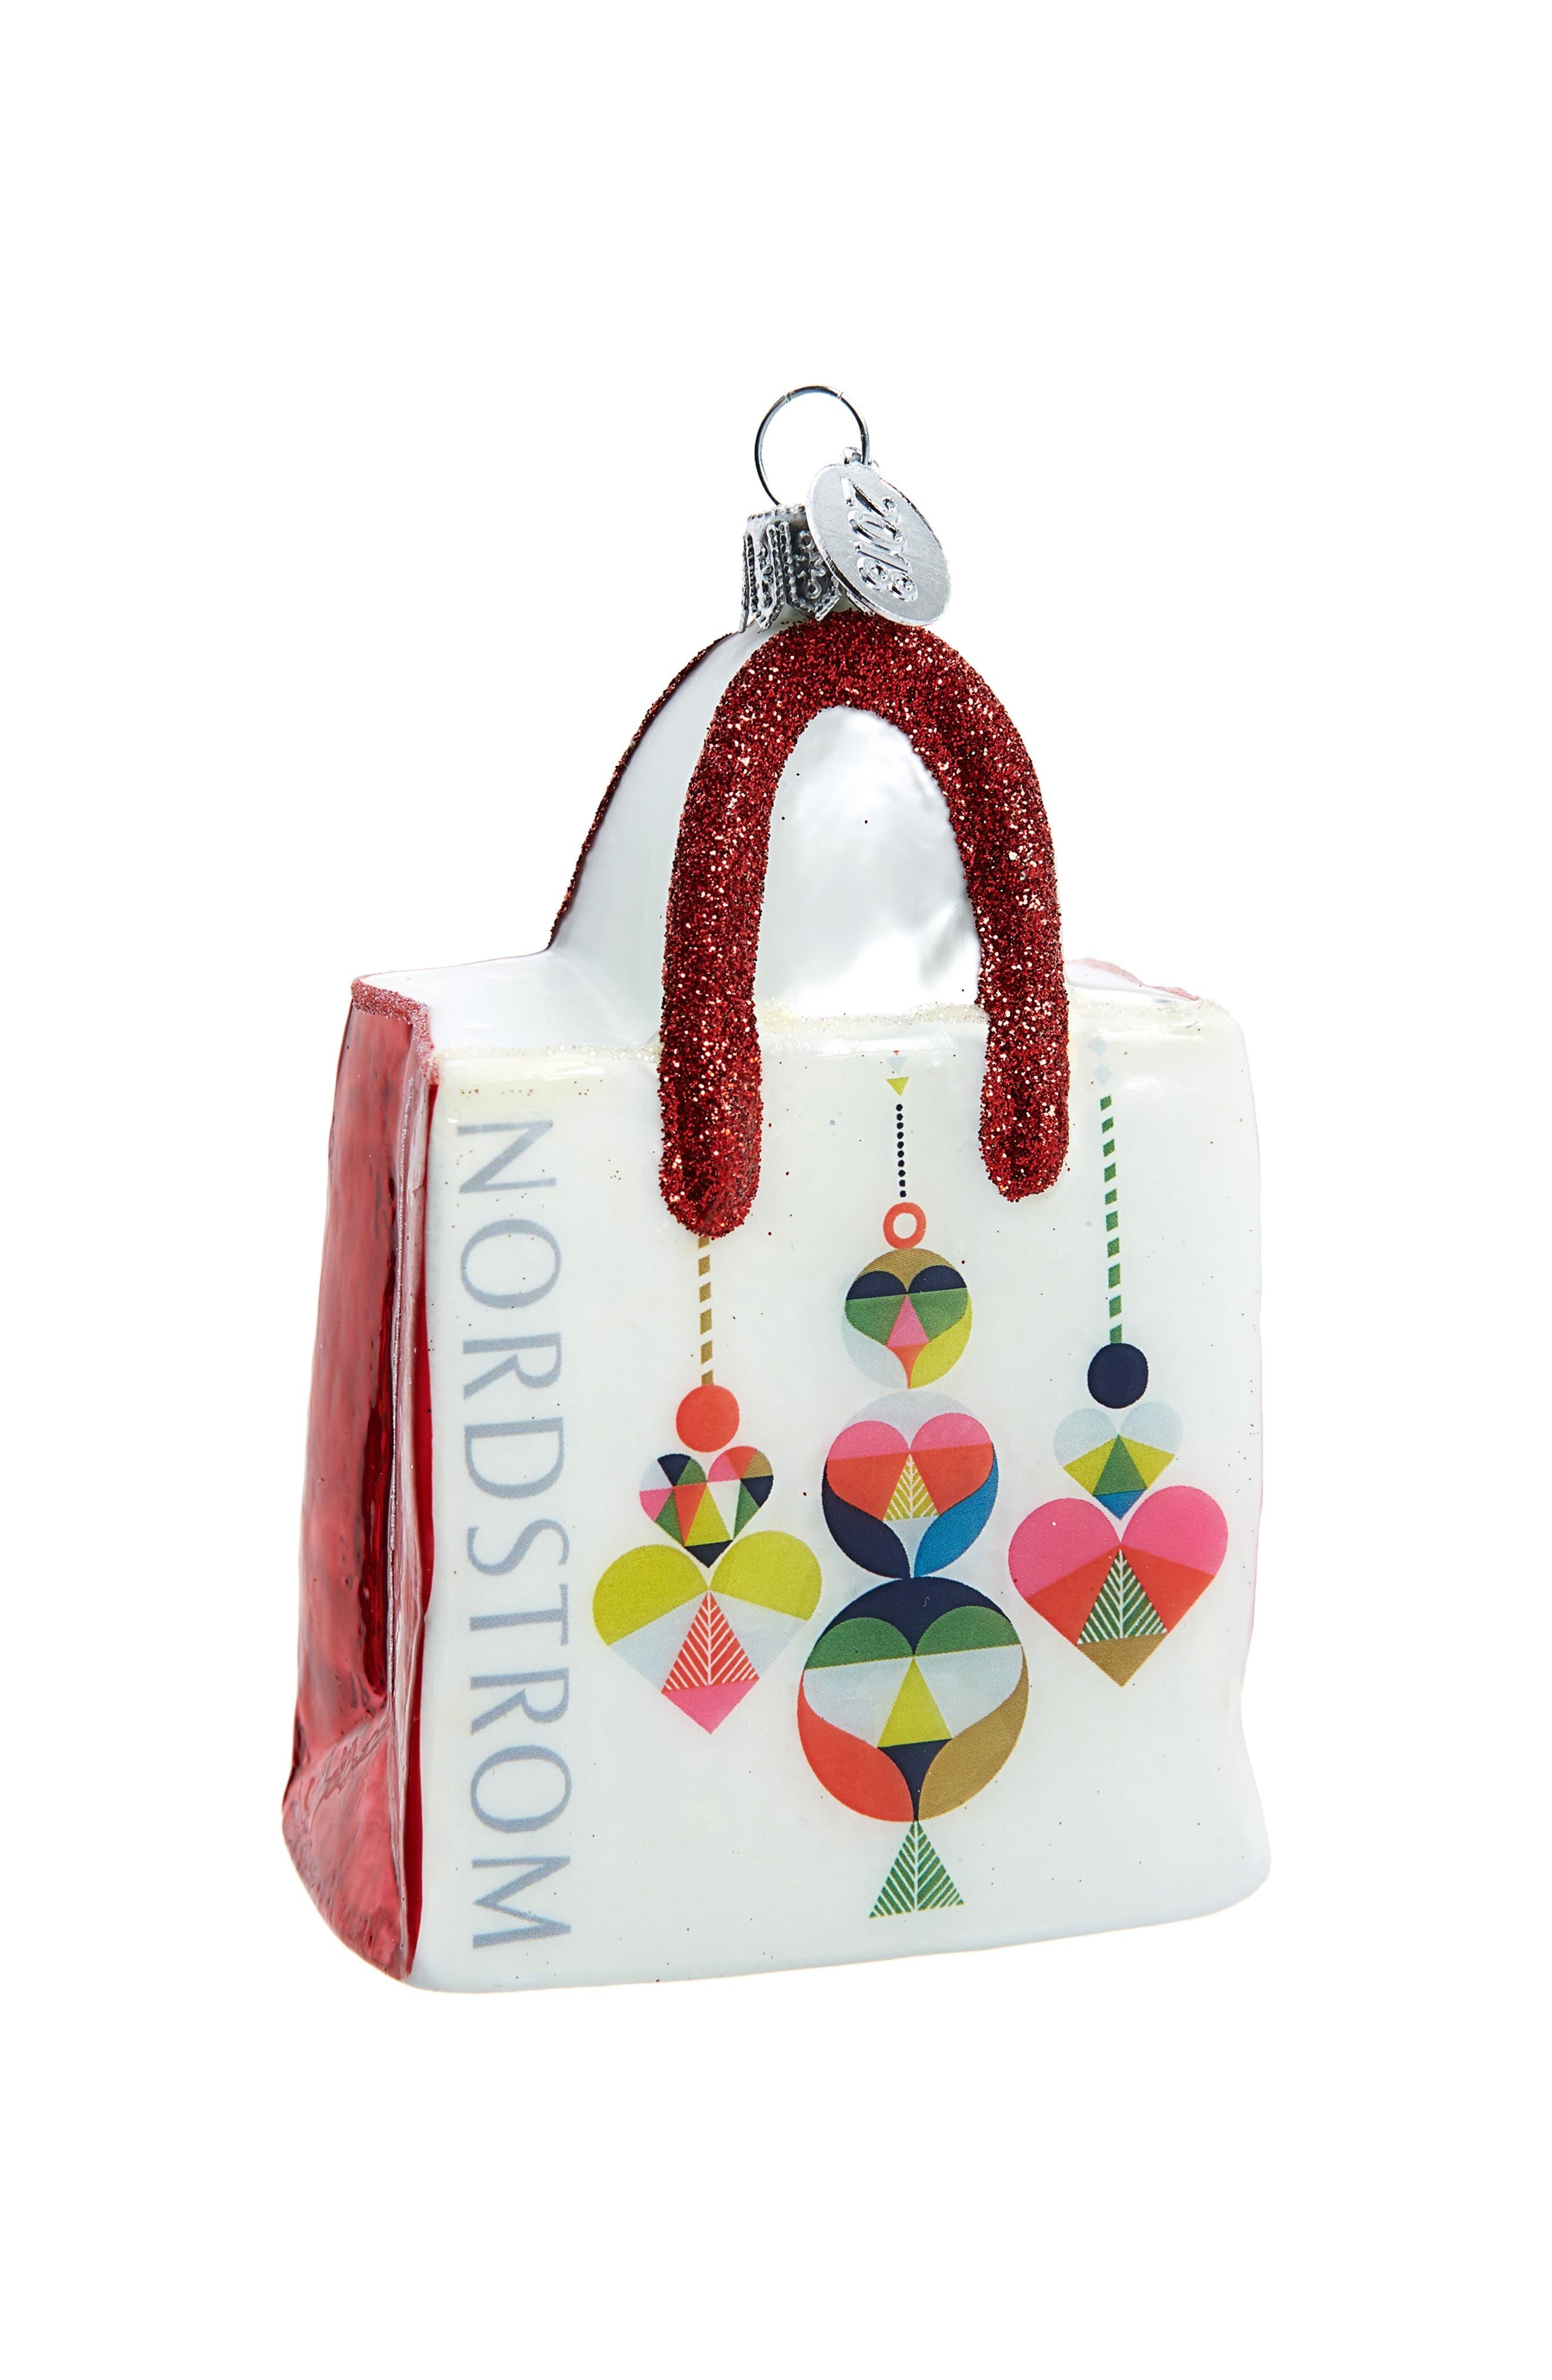 Nordstrom Shopping Bag 2018 Ornament,                             Main thumbnail 1, color,                             100